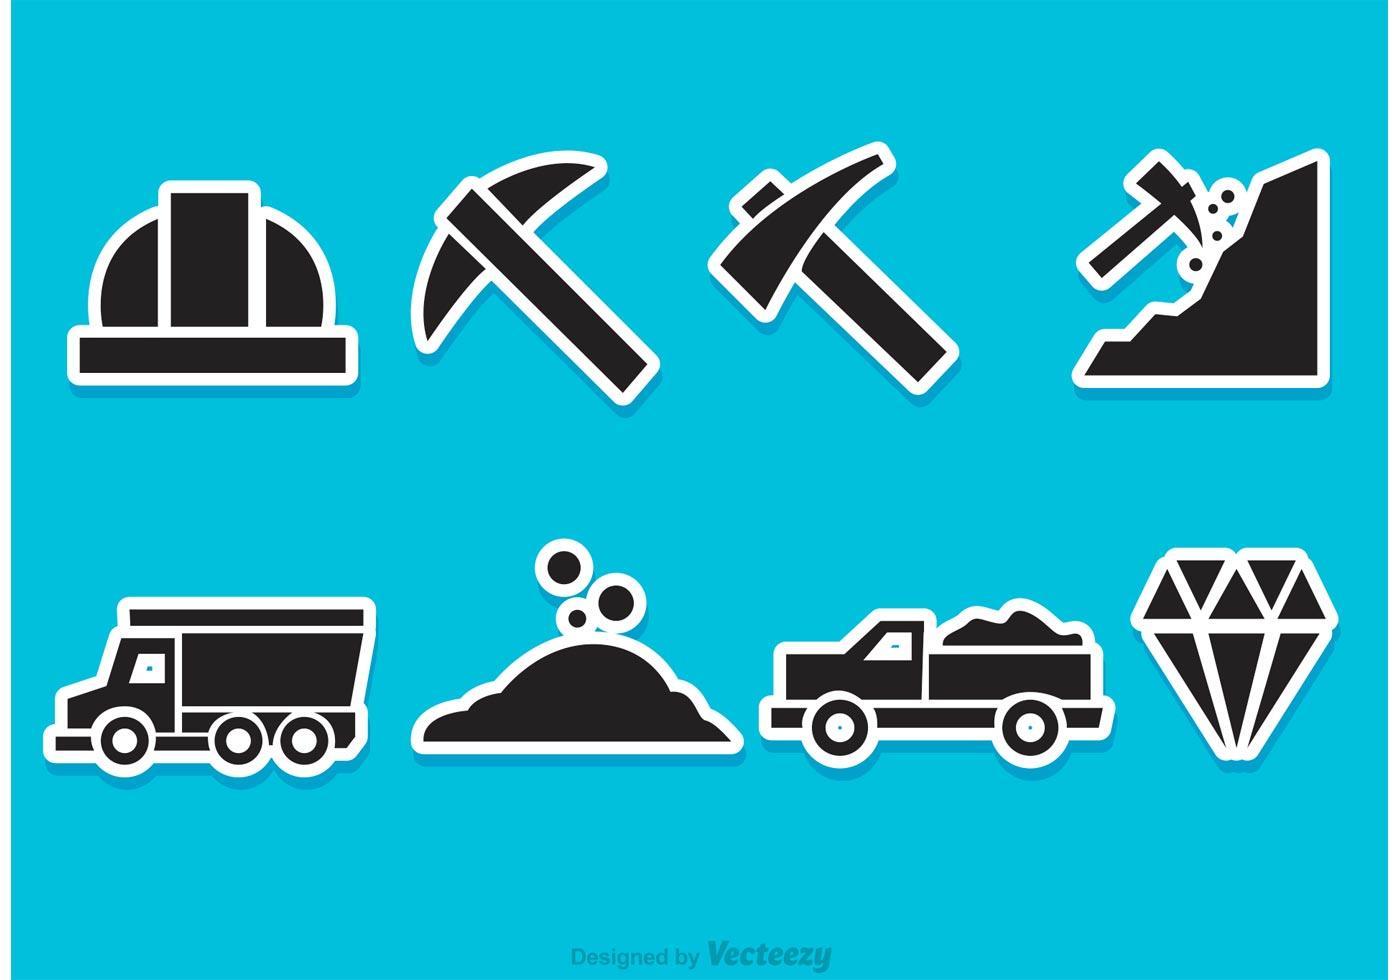 Diamond Mine Vector Icons - Download Free Vectors, Clipart Graphics & Vector Art